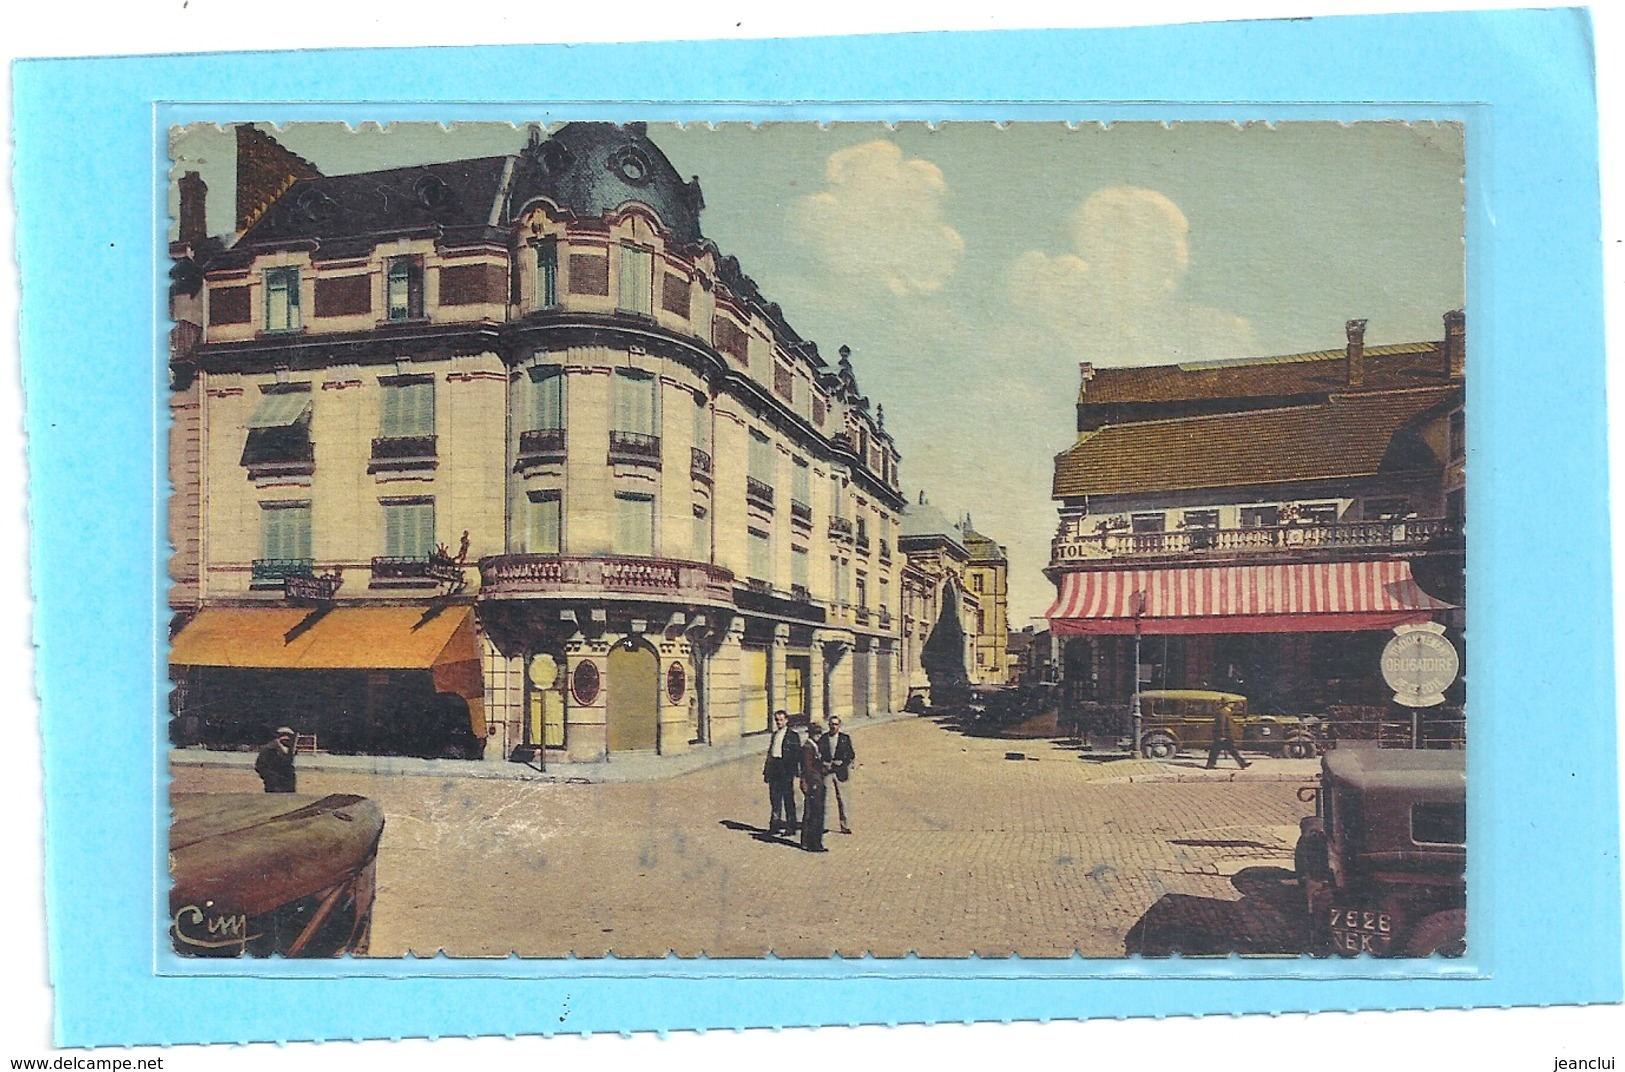 MONTBELIARD . HOTEL BRISTOL - PALAIS DE JUSTICE - COLLEGE CUVIER . CARTE COLORISEE TIMBRE DECOLLE CARTE INTACTE . 2 SCAN - Montbéliard